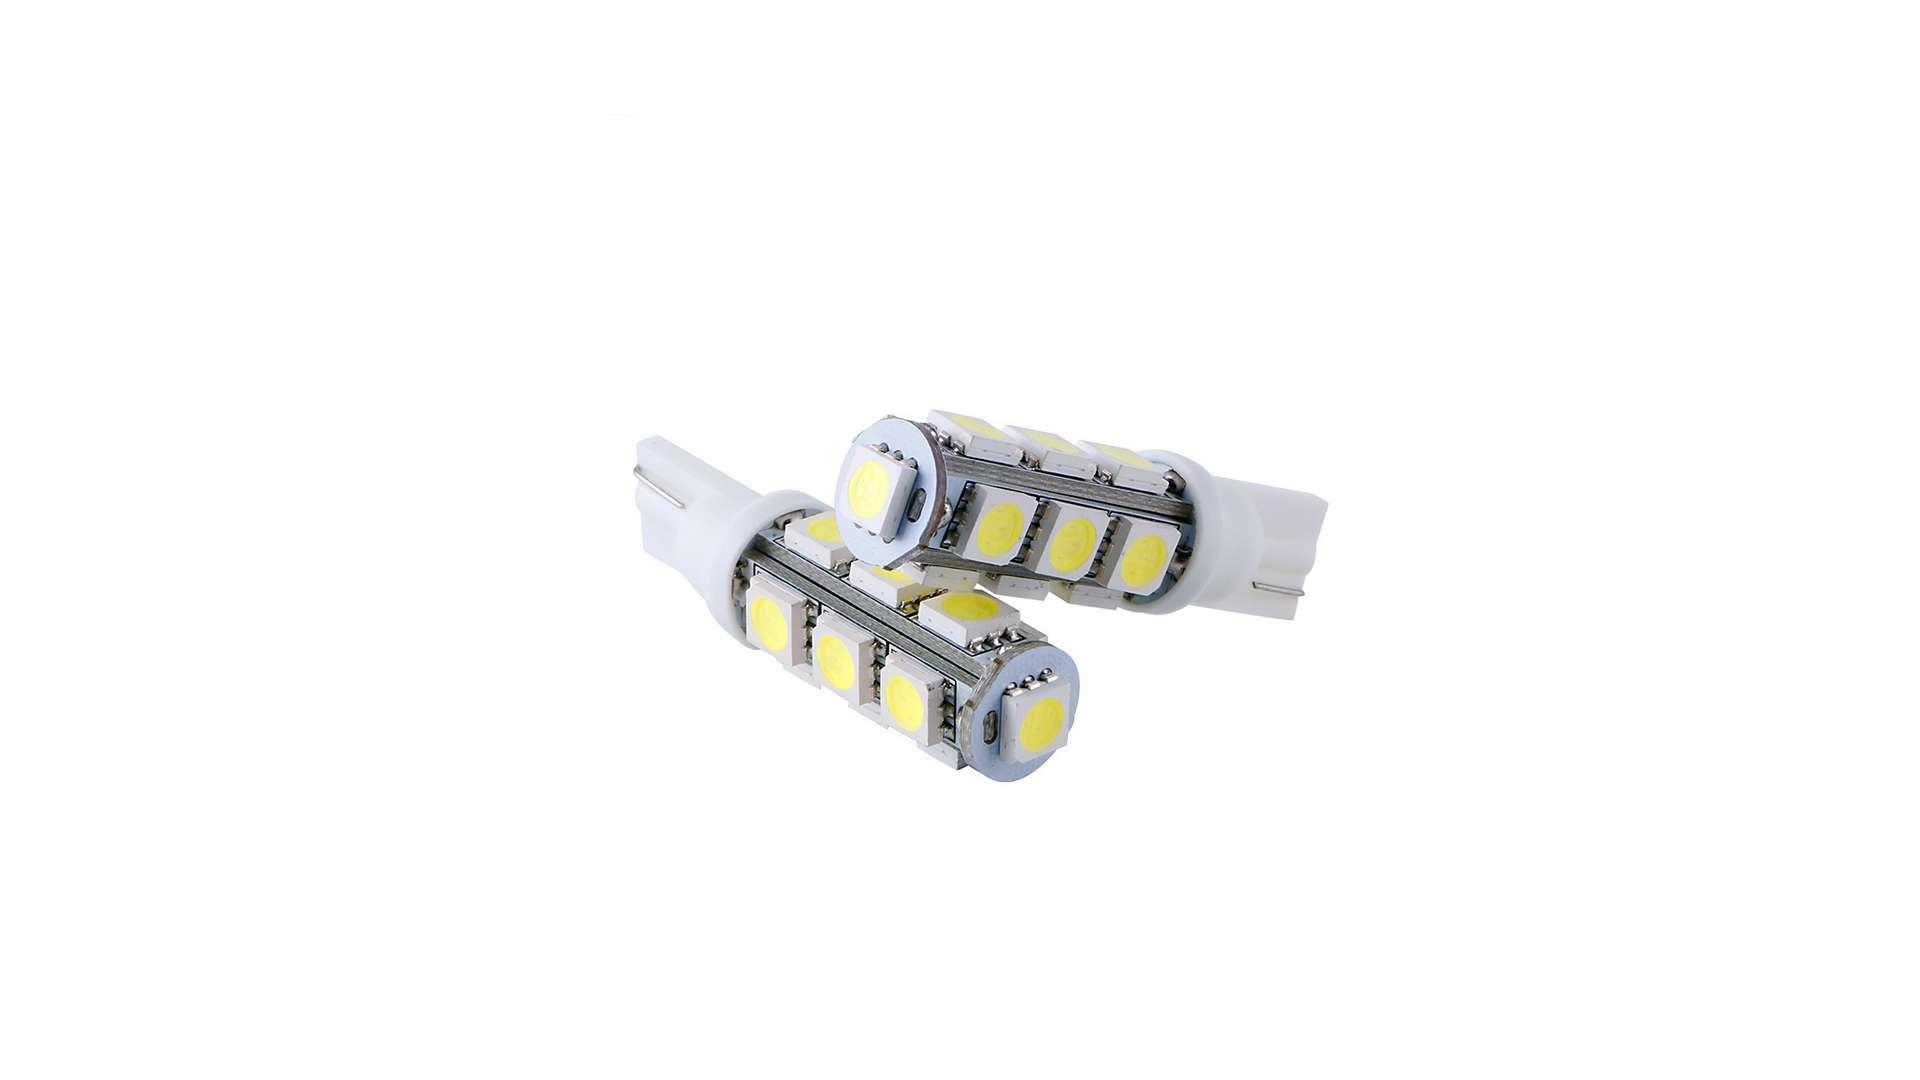 LED LED W5W 13x5050 SMD 12V DC Cold white